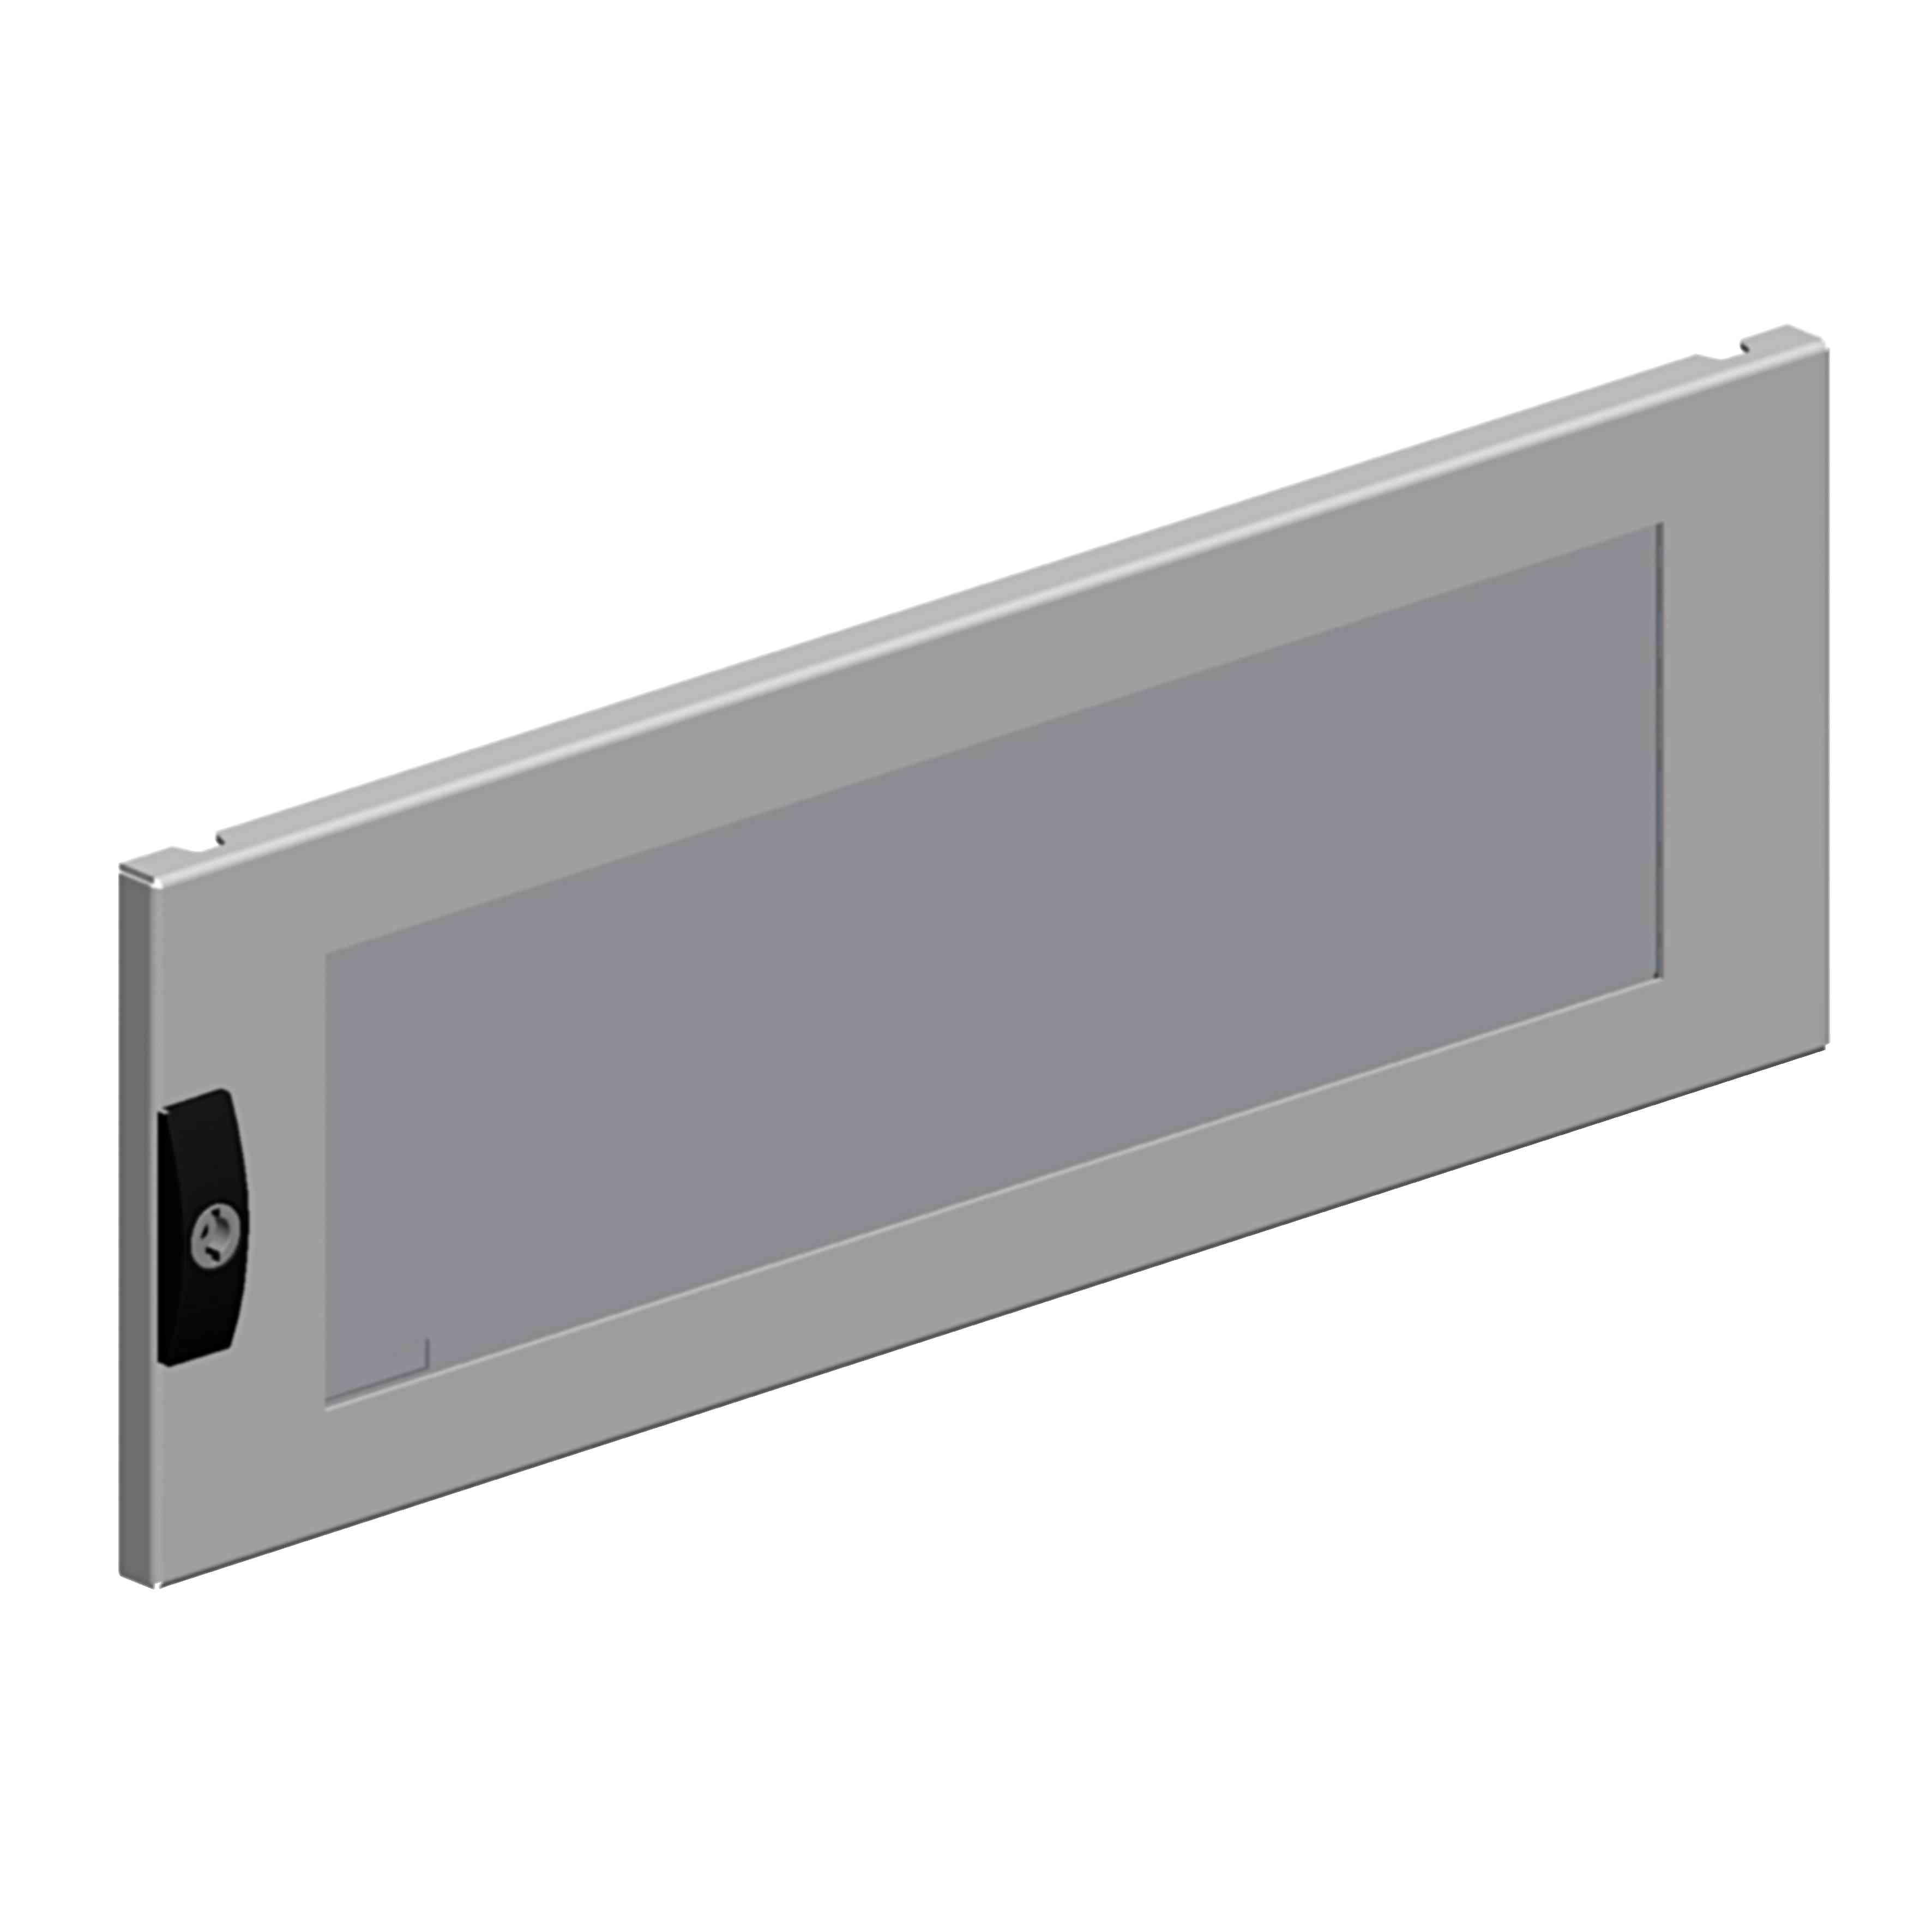 Spacial SF prosojna vrata - 200 x 600 mm